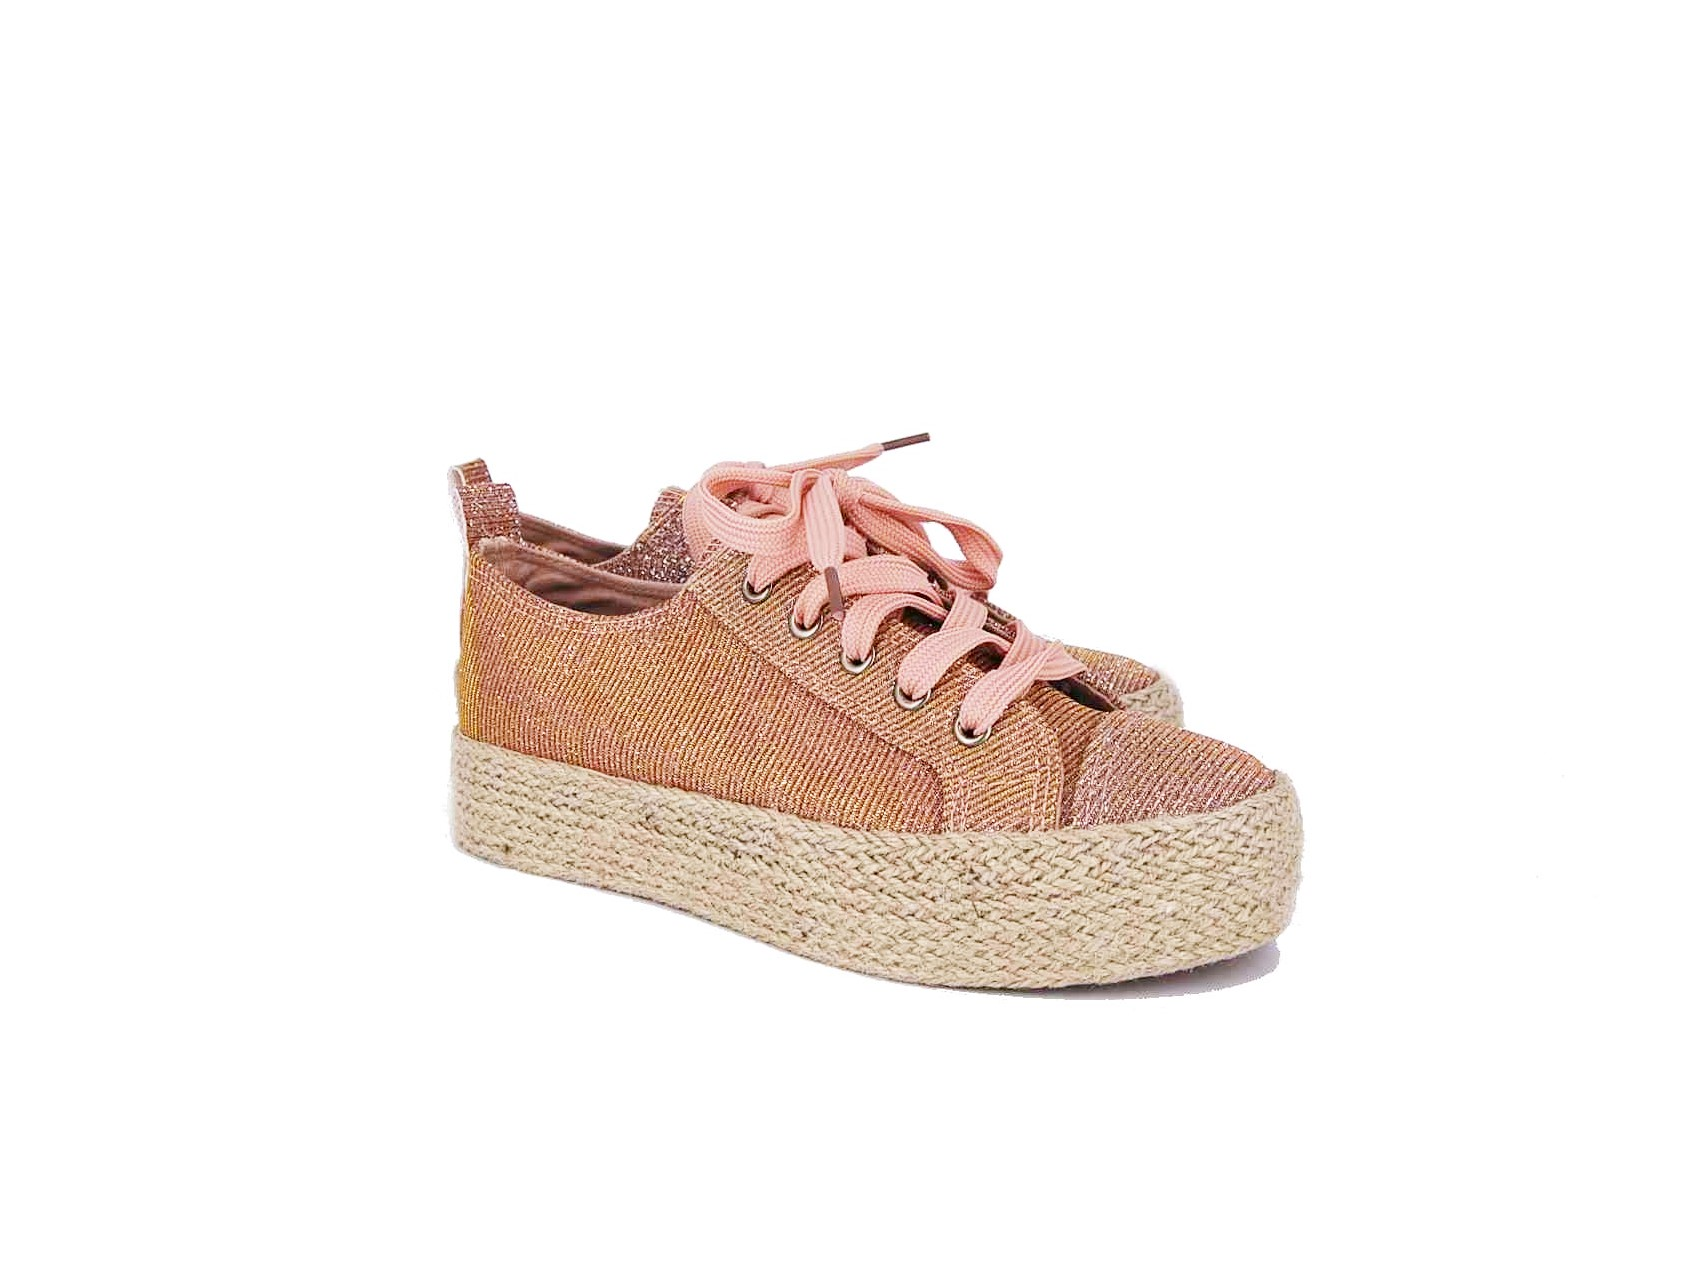 24c30af7c4e Verde sneaker γυναικείο ροζ-χρυσό